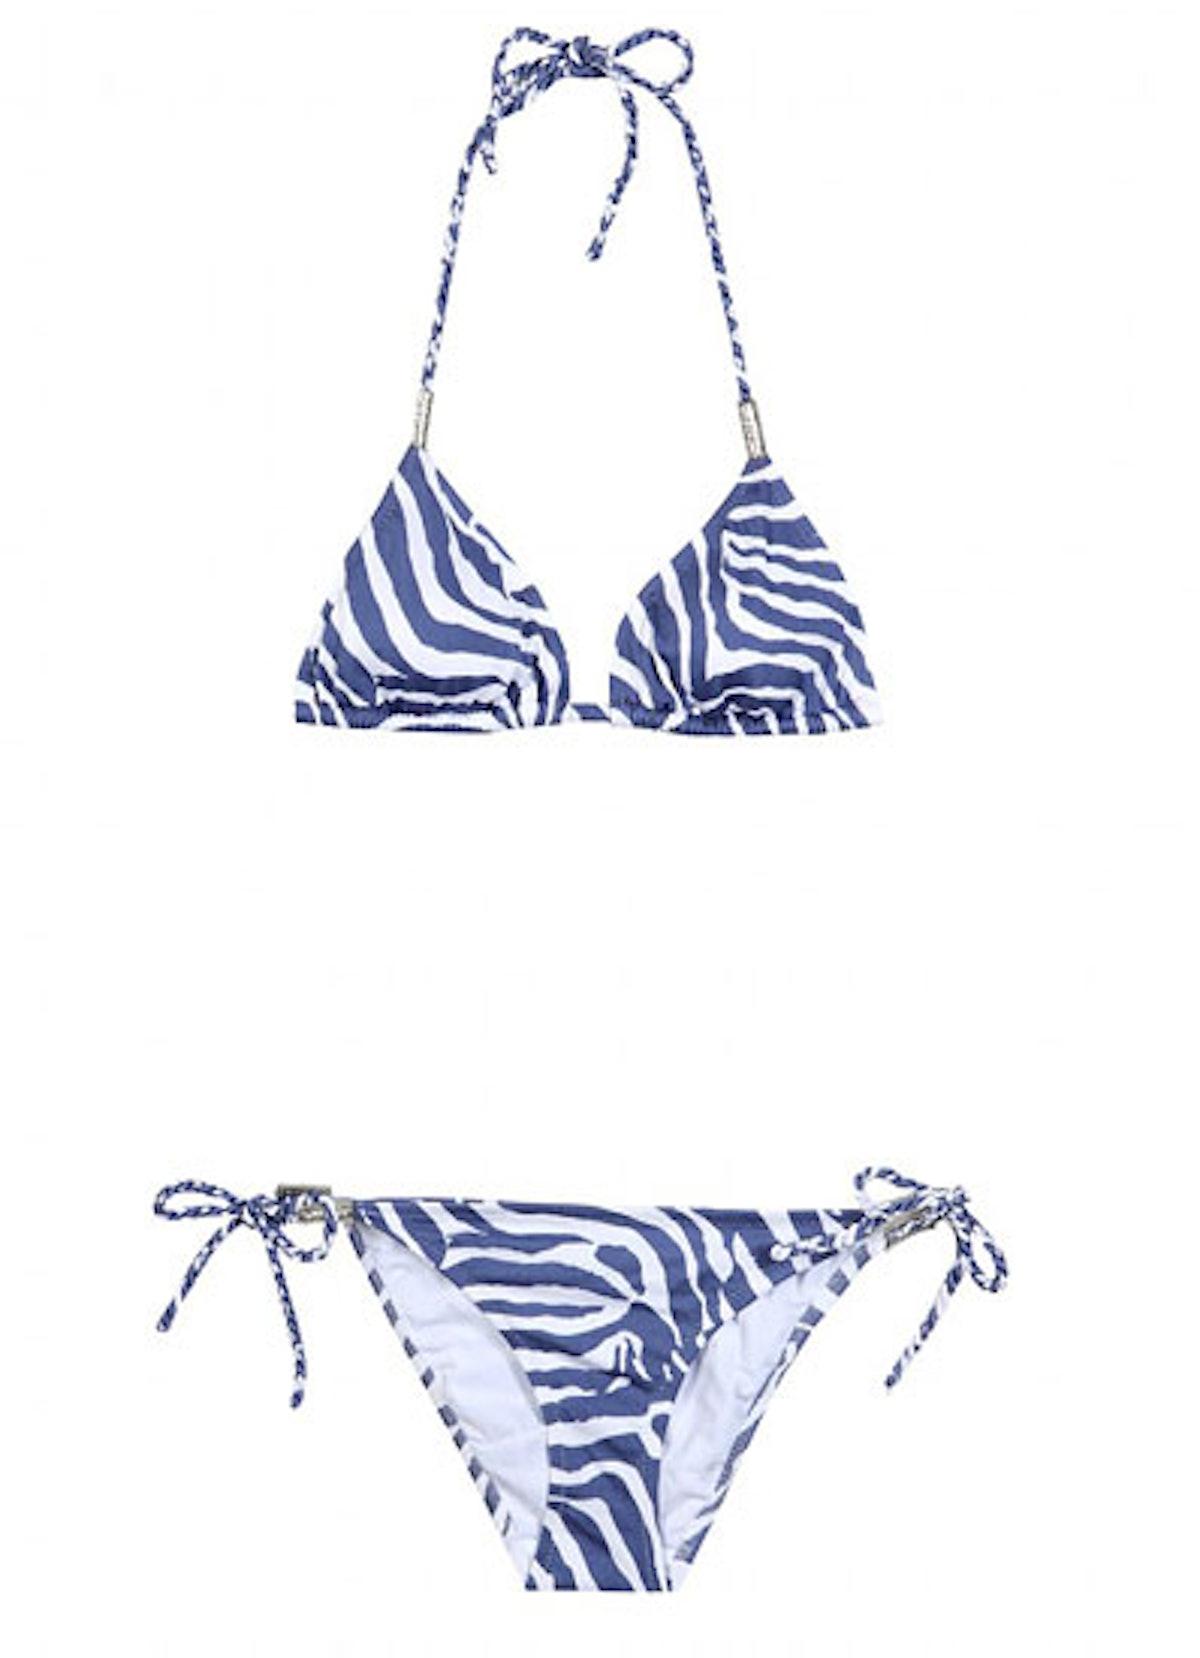 fass-animal-print-swimwear-trend-06-v.jpg